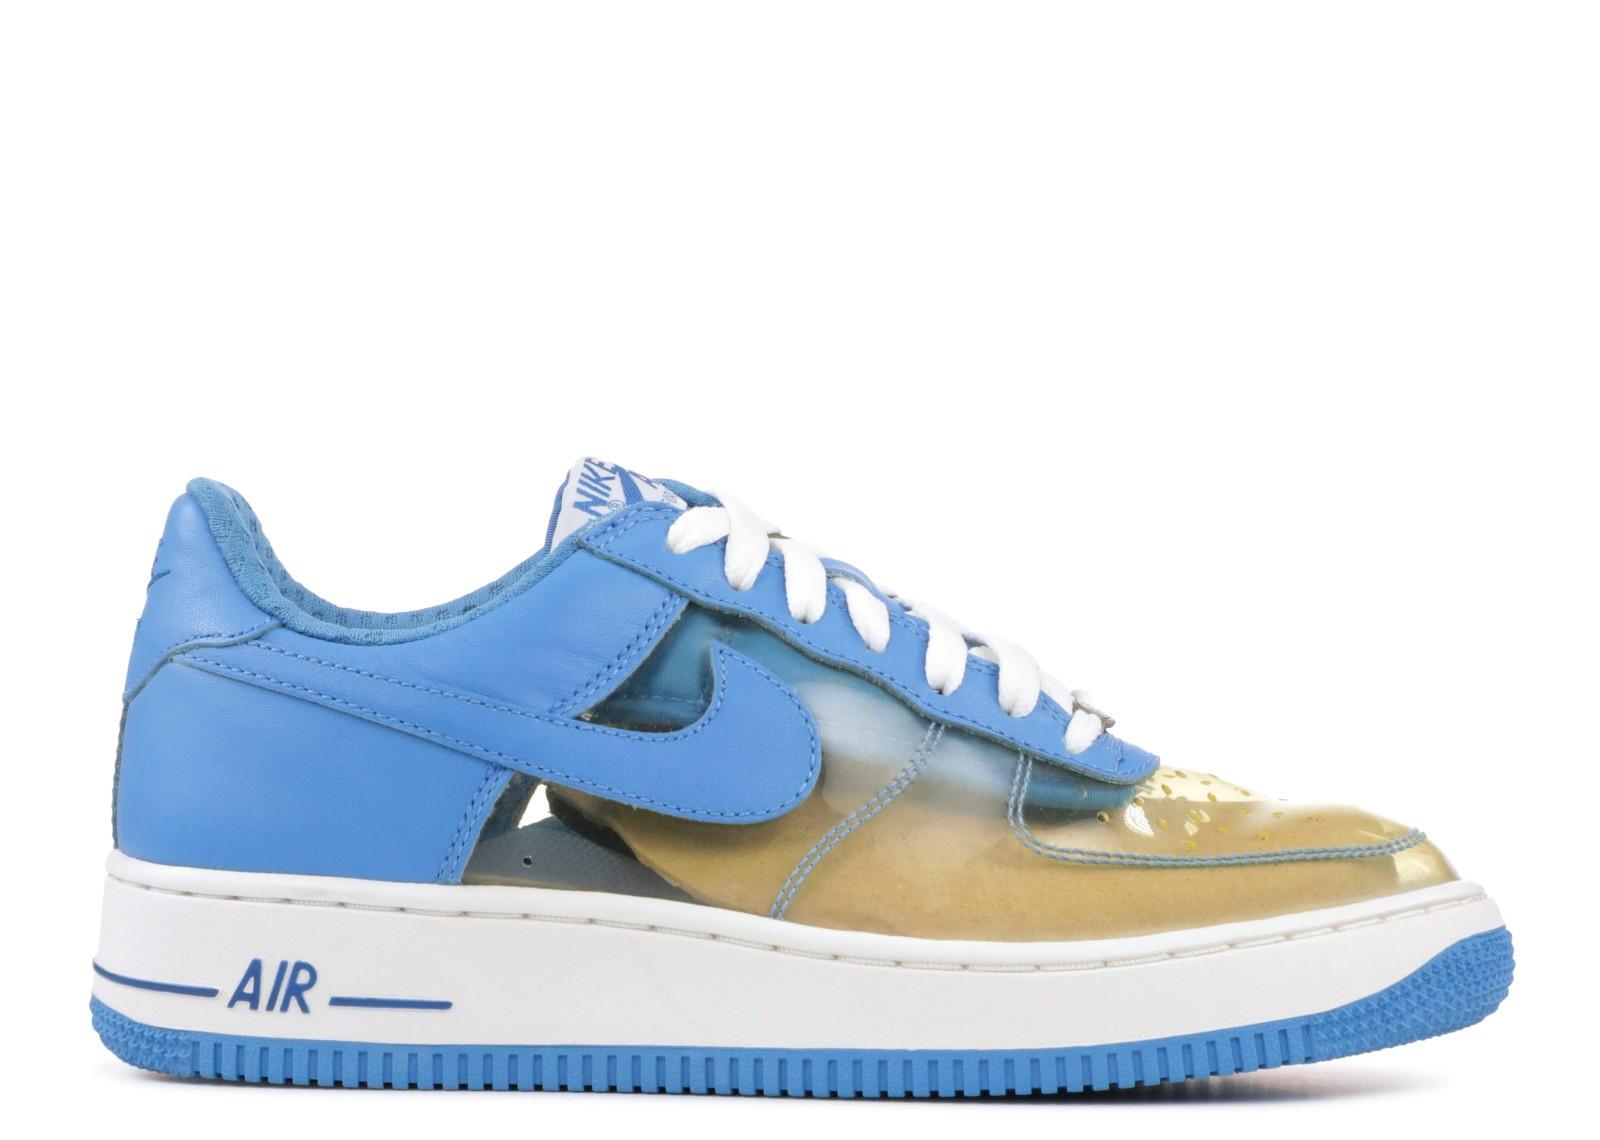 25cb3a00dc6 Air Force 1 Premium Fantastic 4 Invisible Woman Harbor Blue Clear White  Military 313641-941